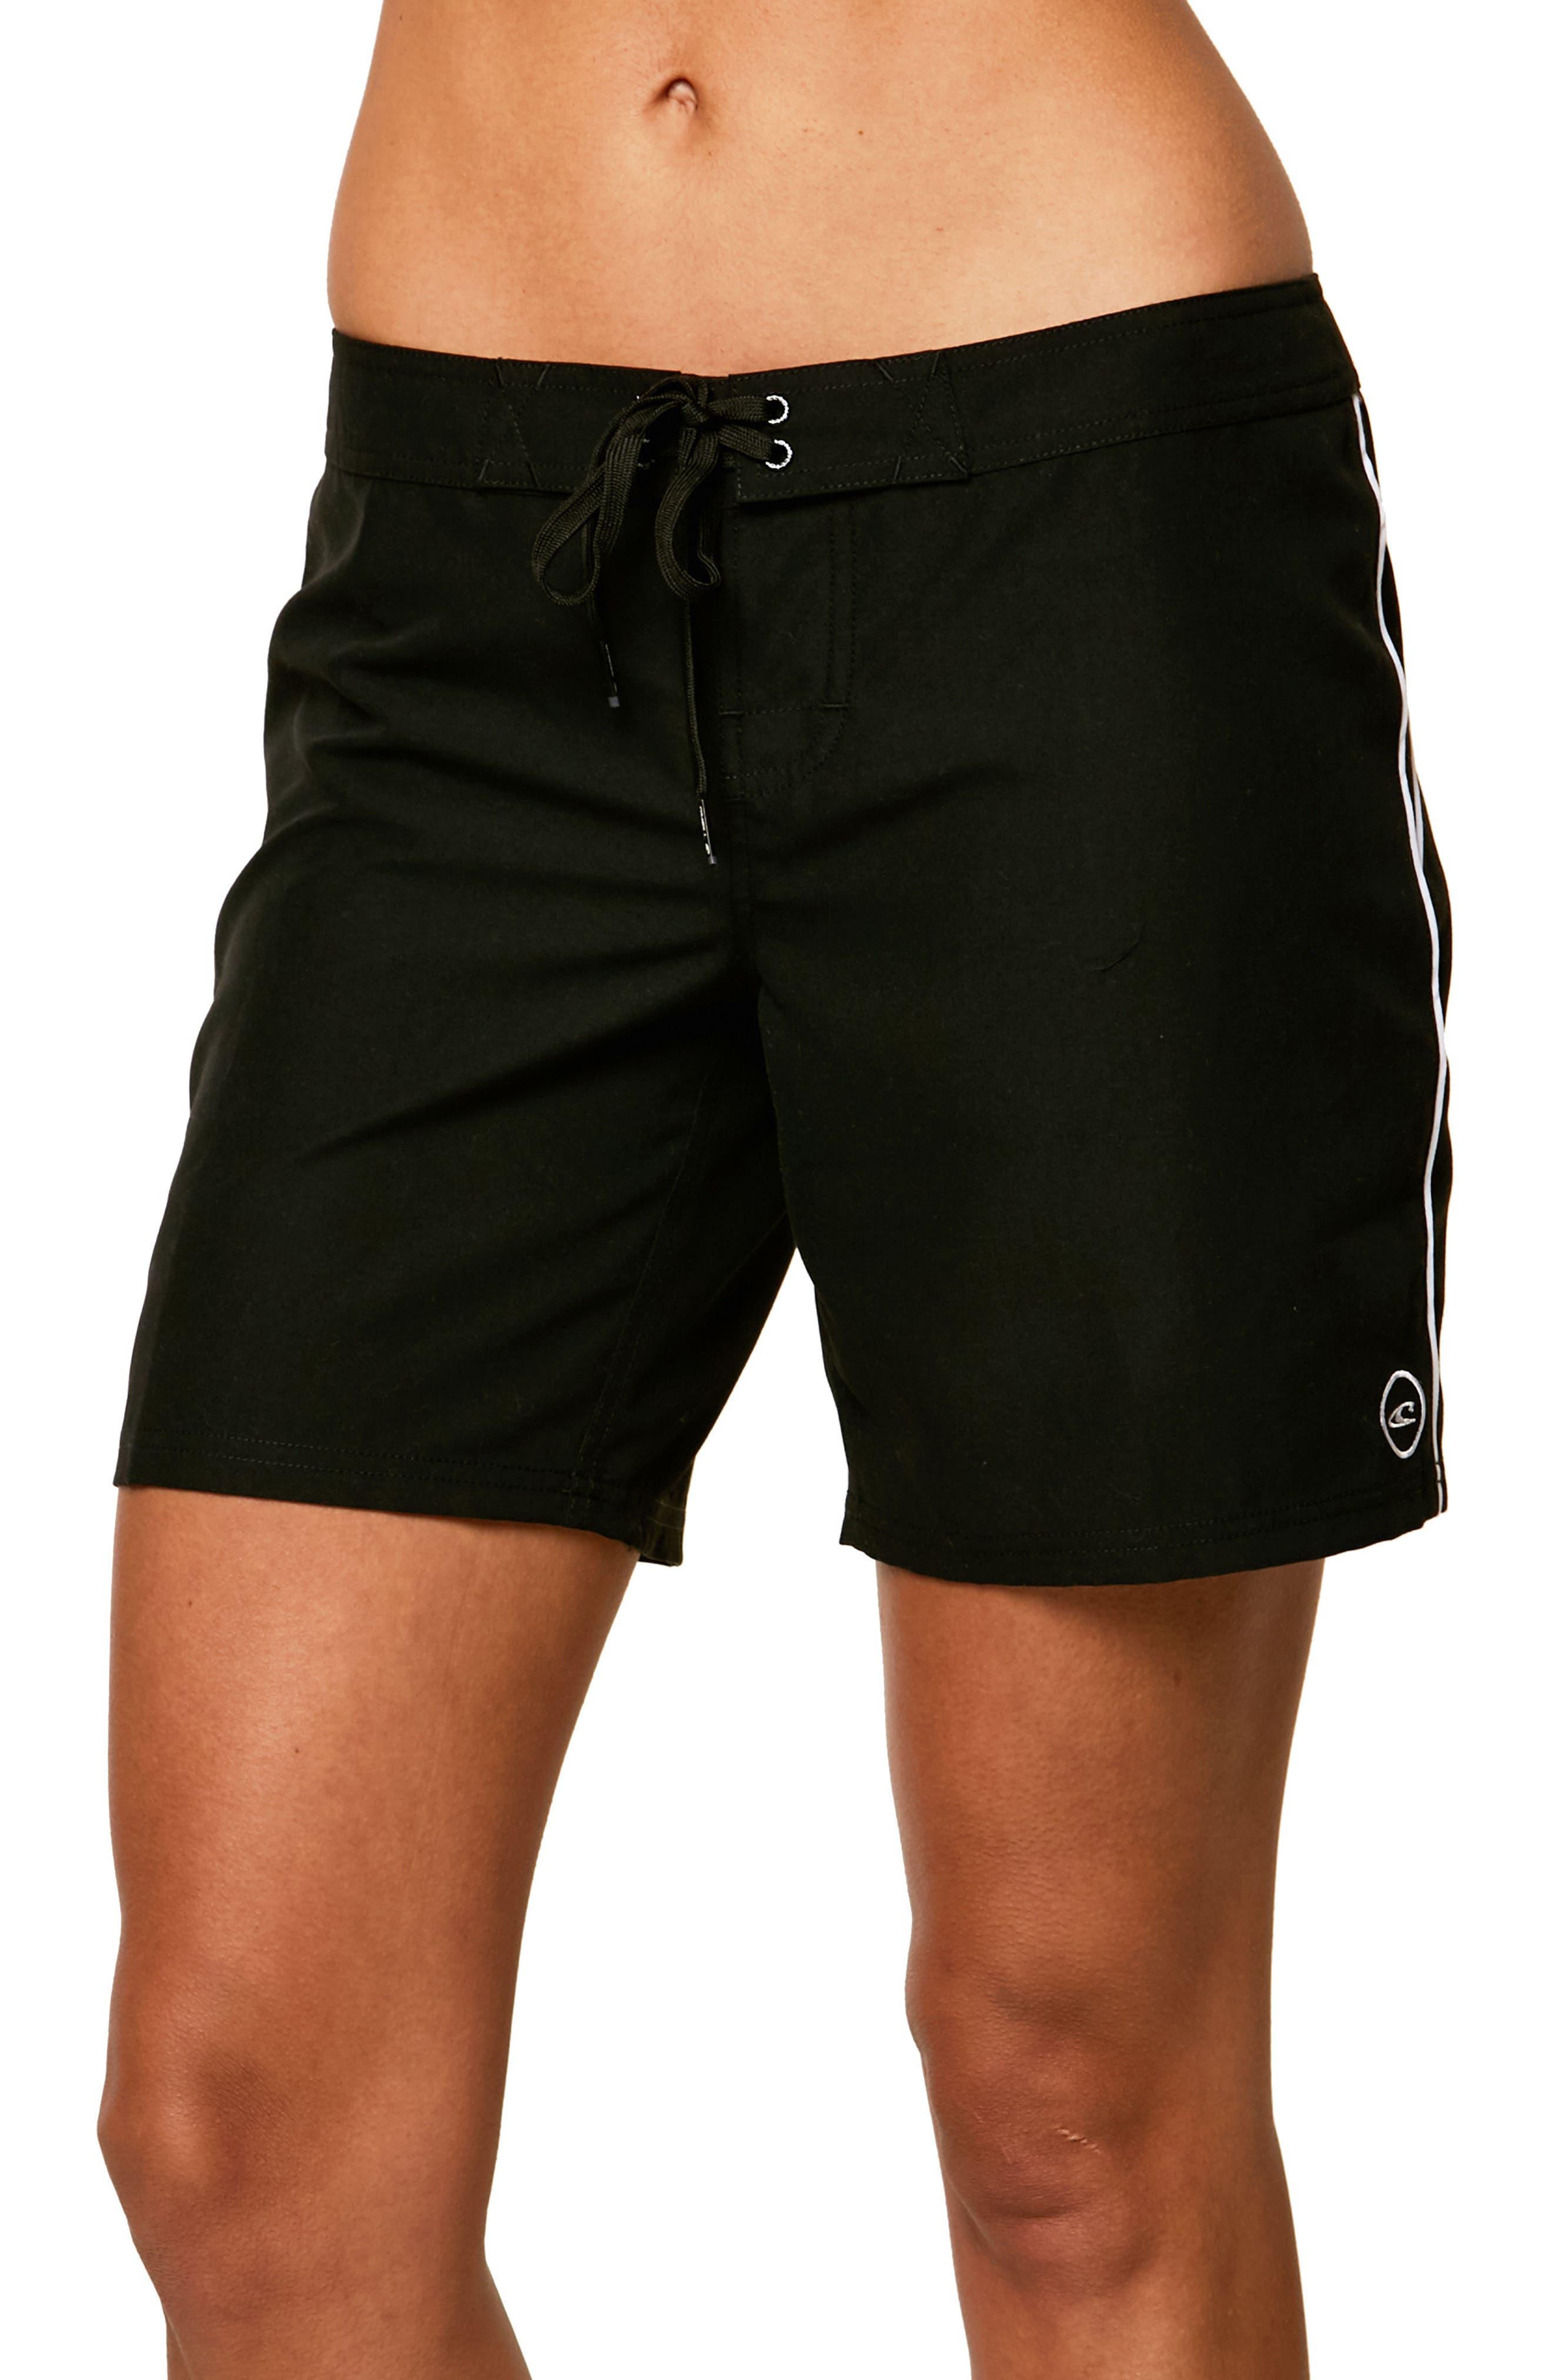 Salt Water Board Shorts,                         Main,                         color, Black